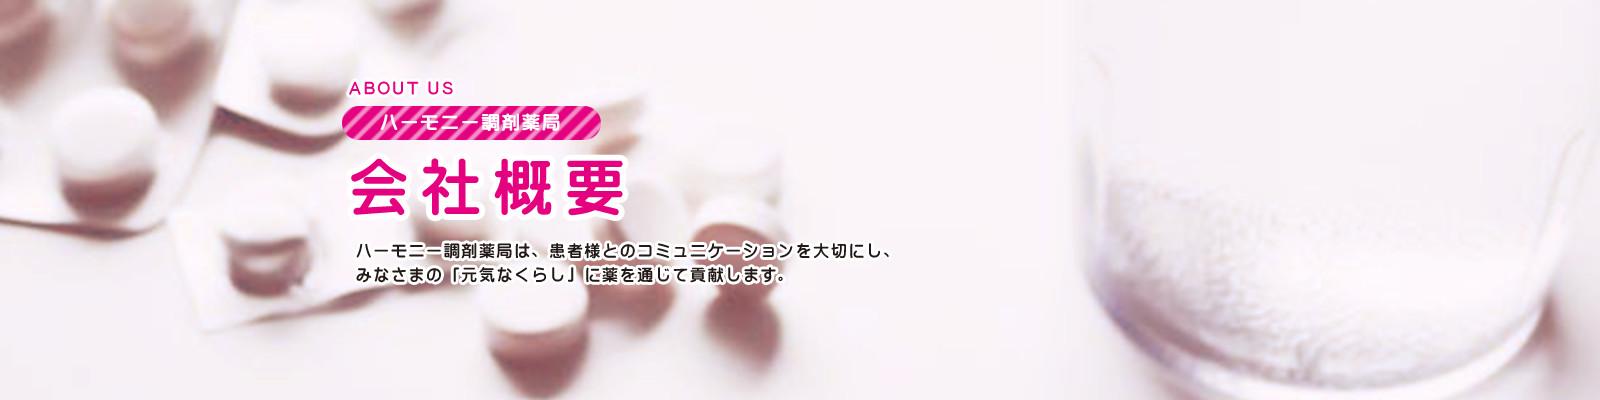 big_company